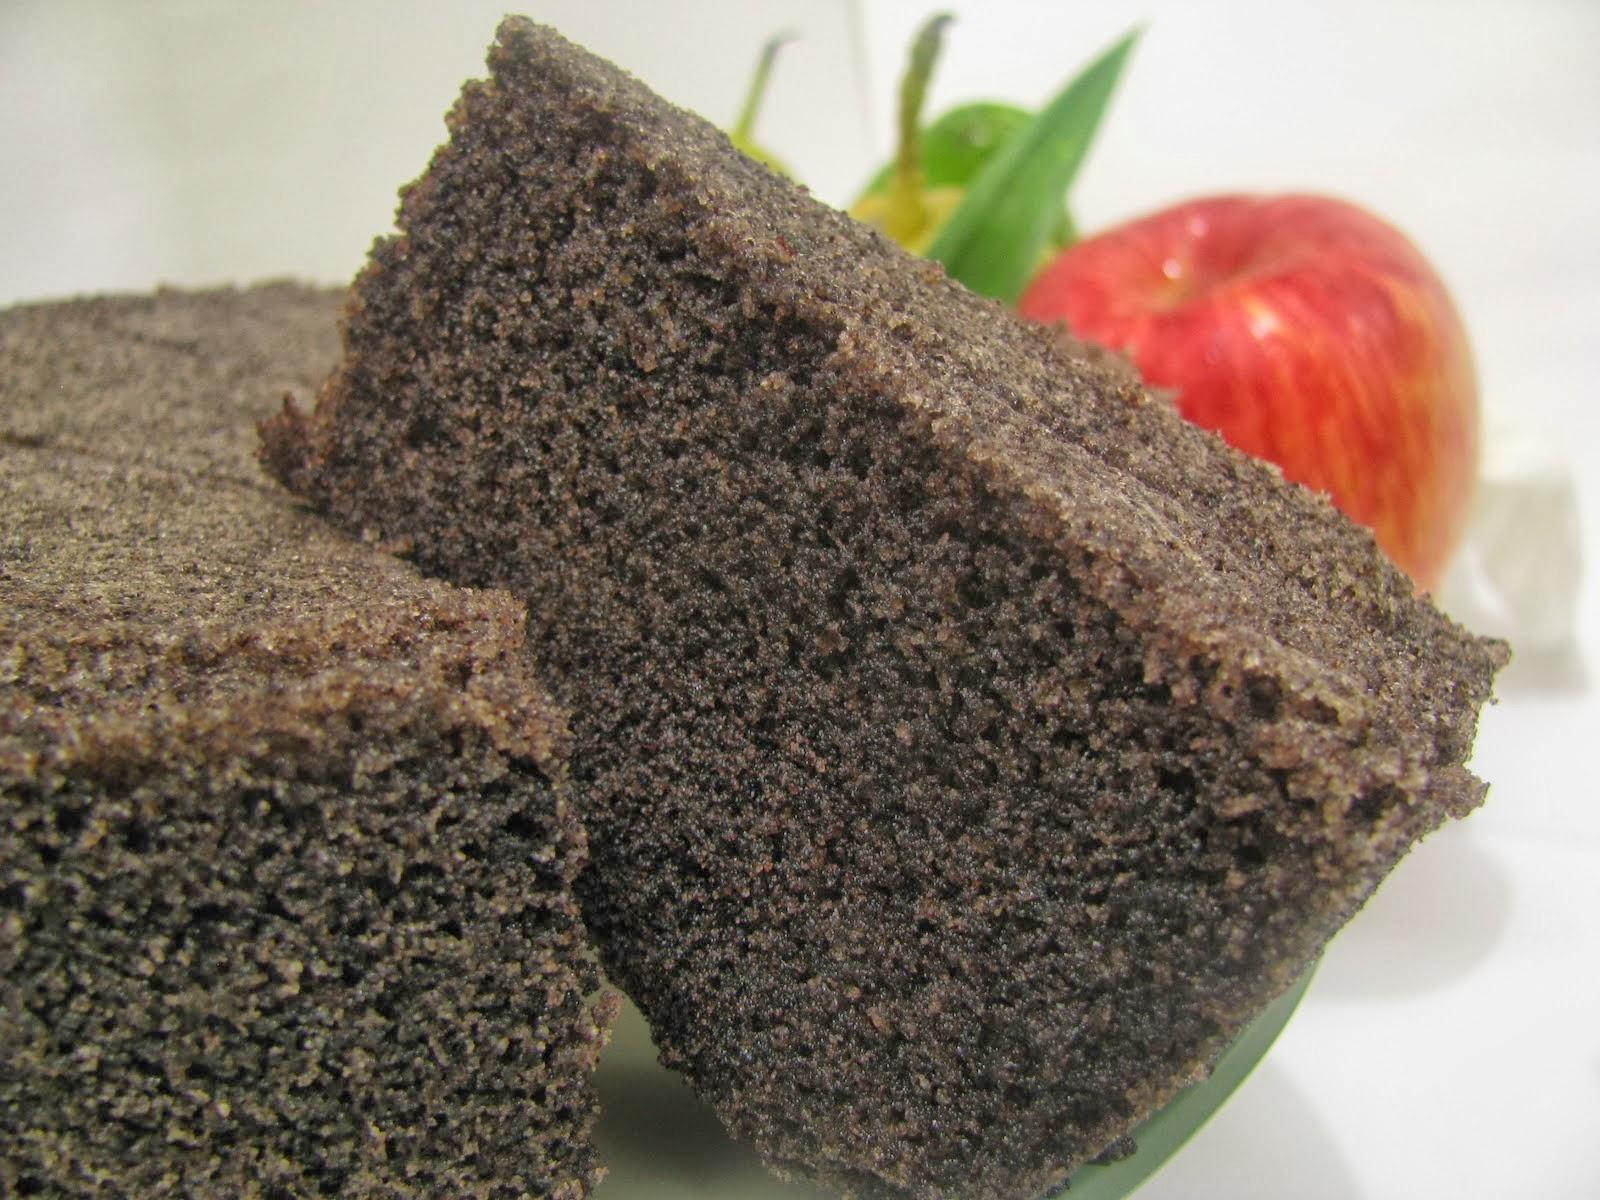 Resep Cake Kukus Ketan Hitam Jtt: RESEP BOLU KUKUS KETAN HITAM LEMBUT 。•*¨*• CARA MEMBUAT, RESEP